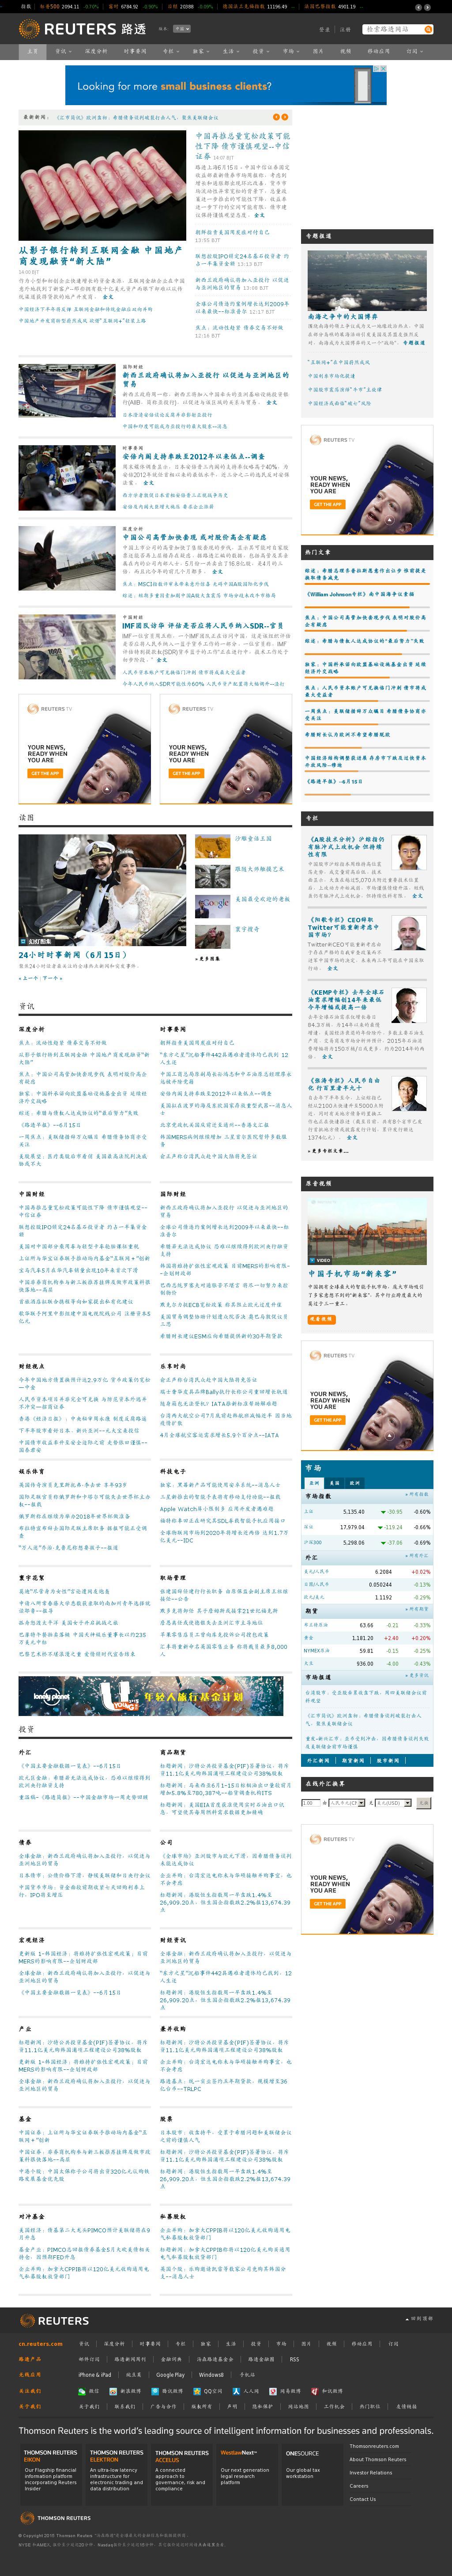 Reuters (Chinese) at Monday June 15, 2015, 6:27 a.m. UTC